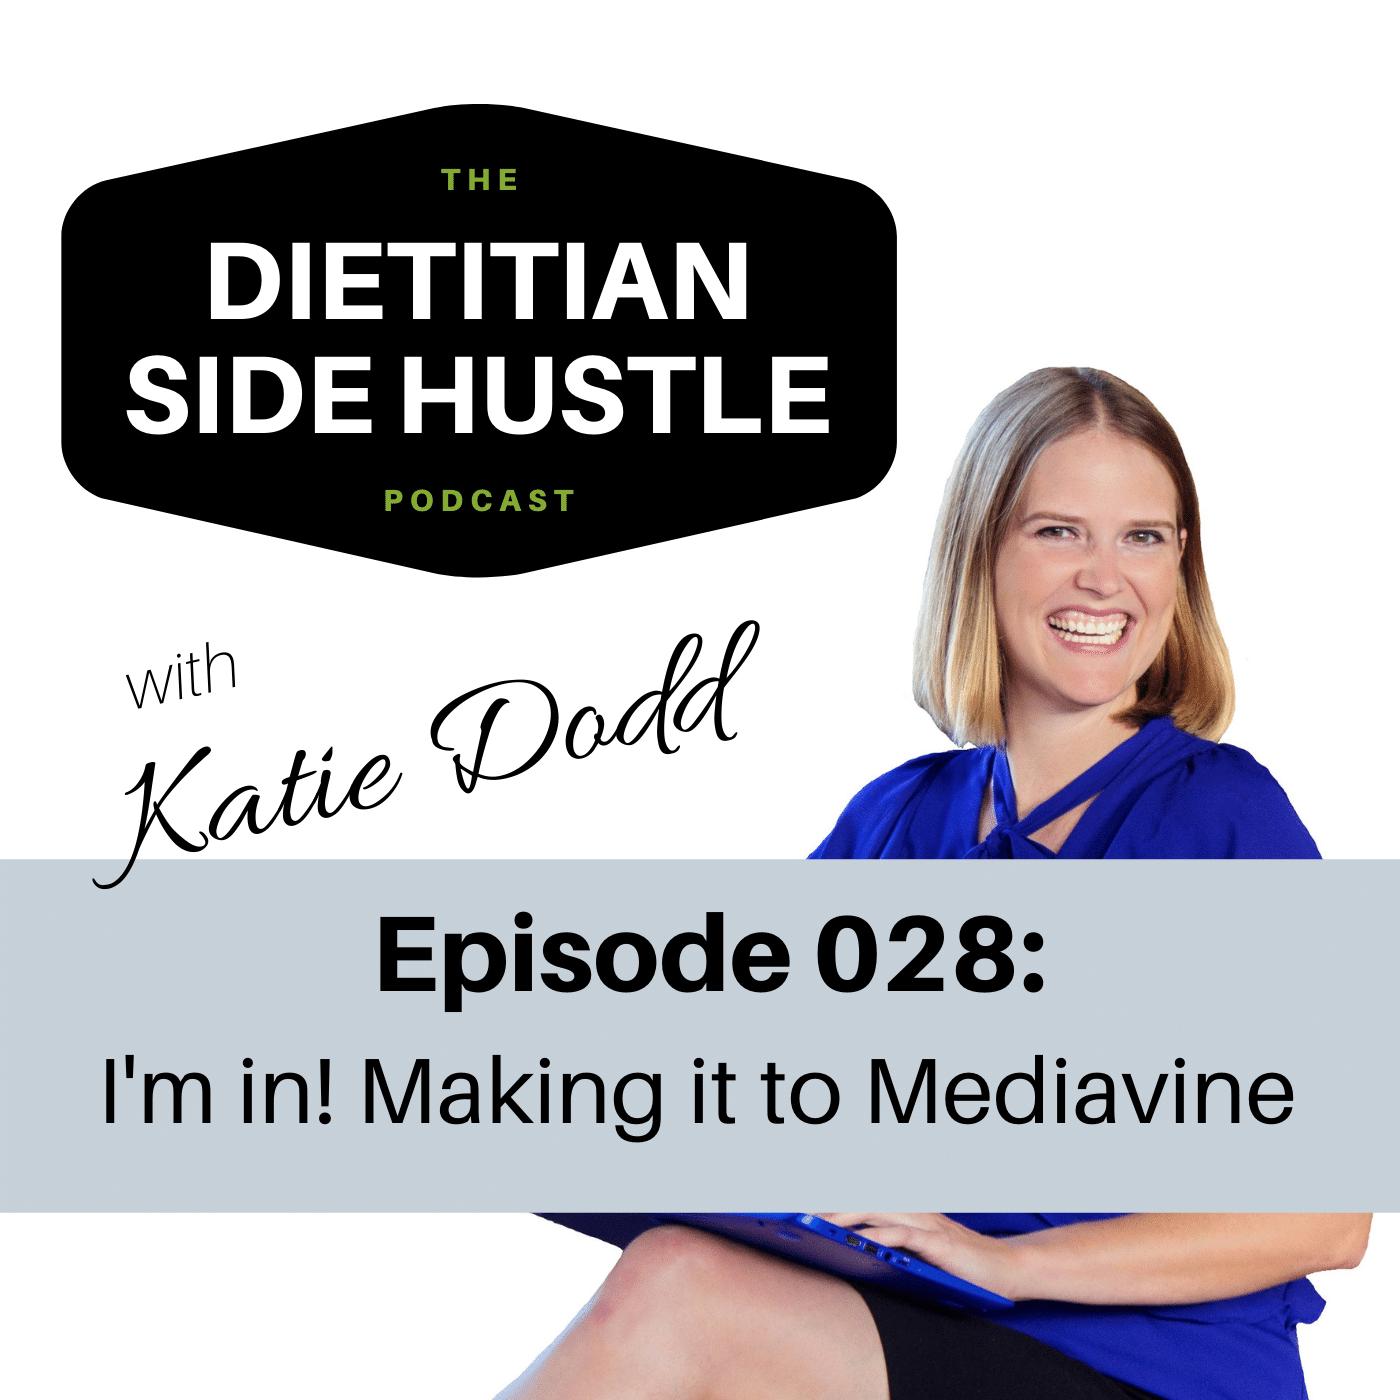 Episode 028: I'm in! Making it to Mediavine